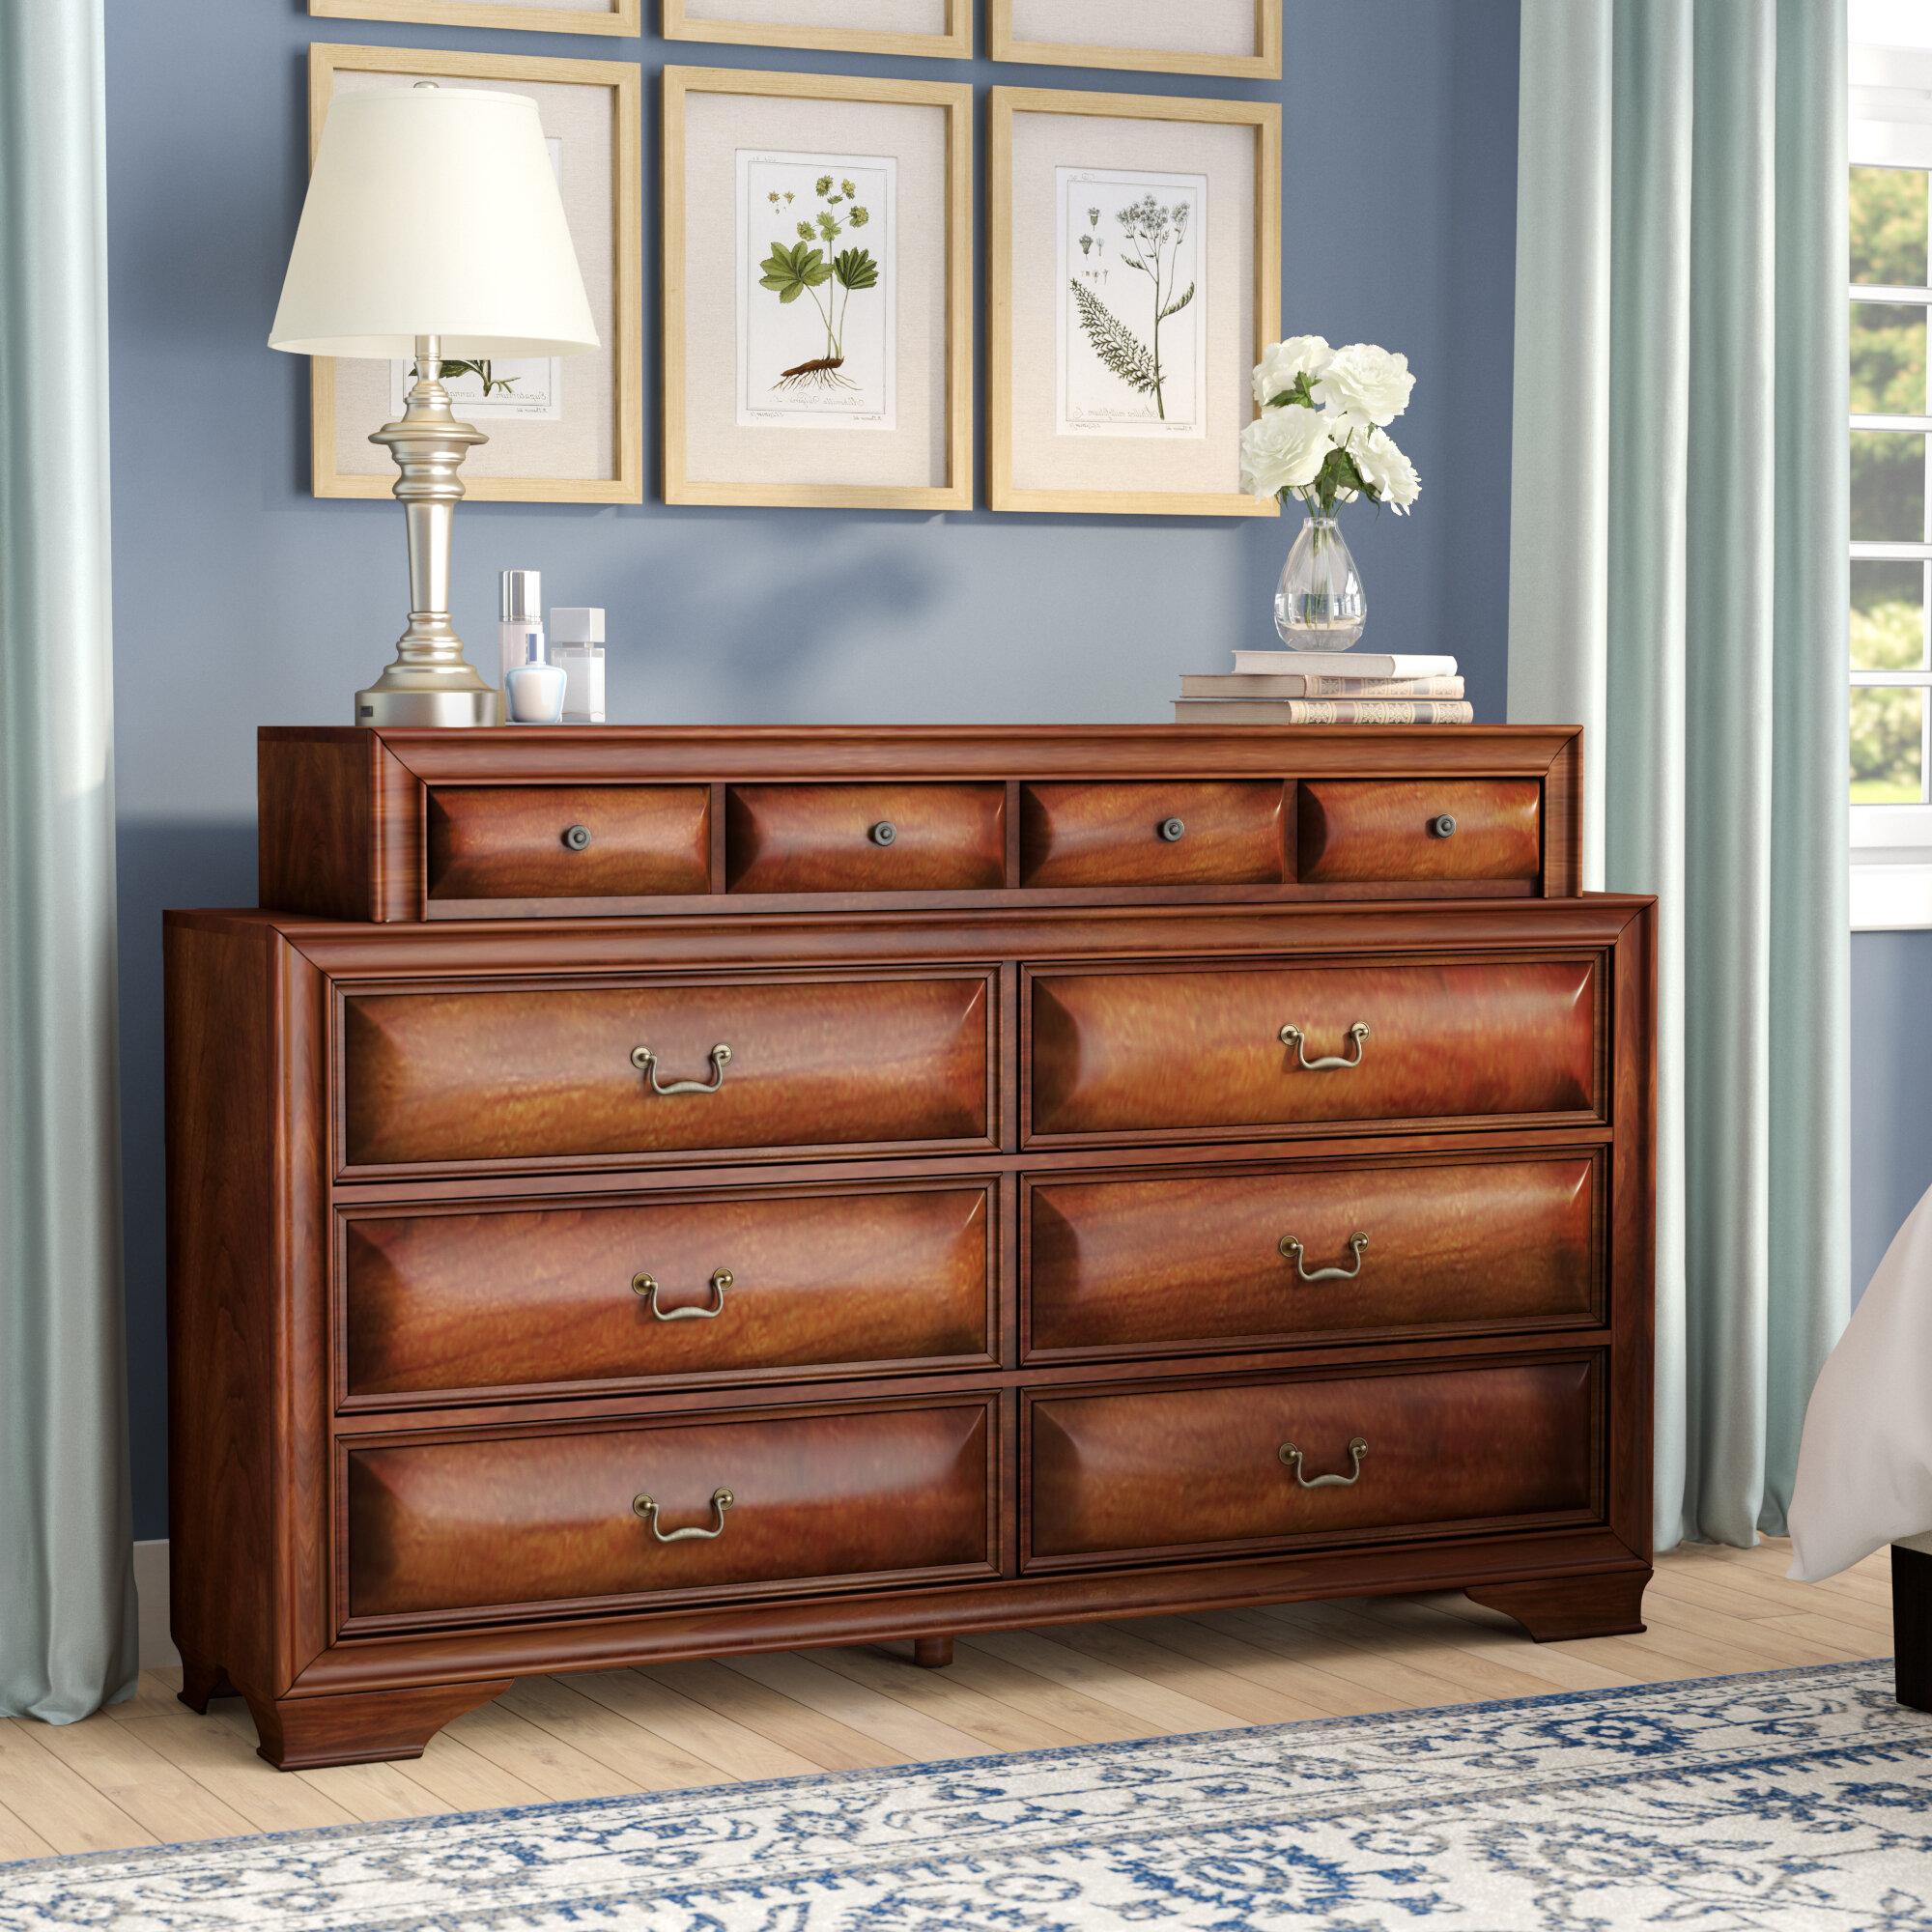 10 Drawer Bedroom Dresser Wayfair